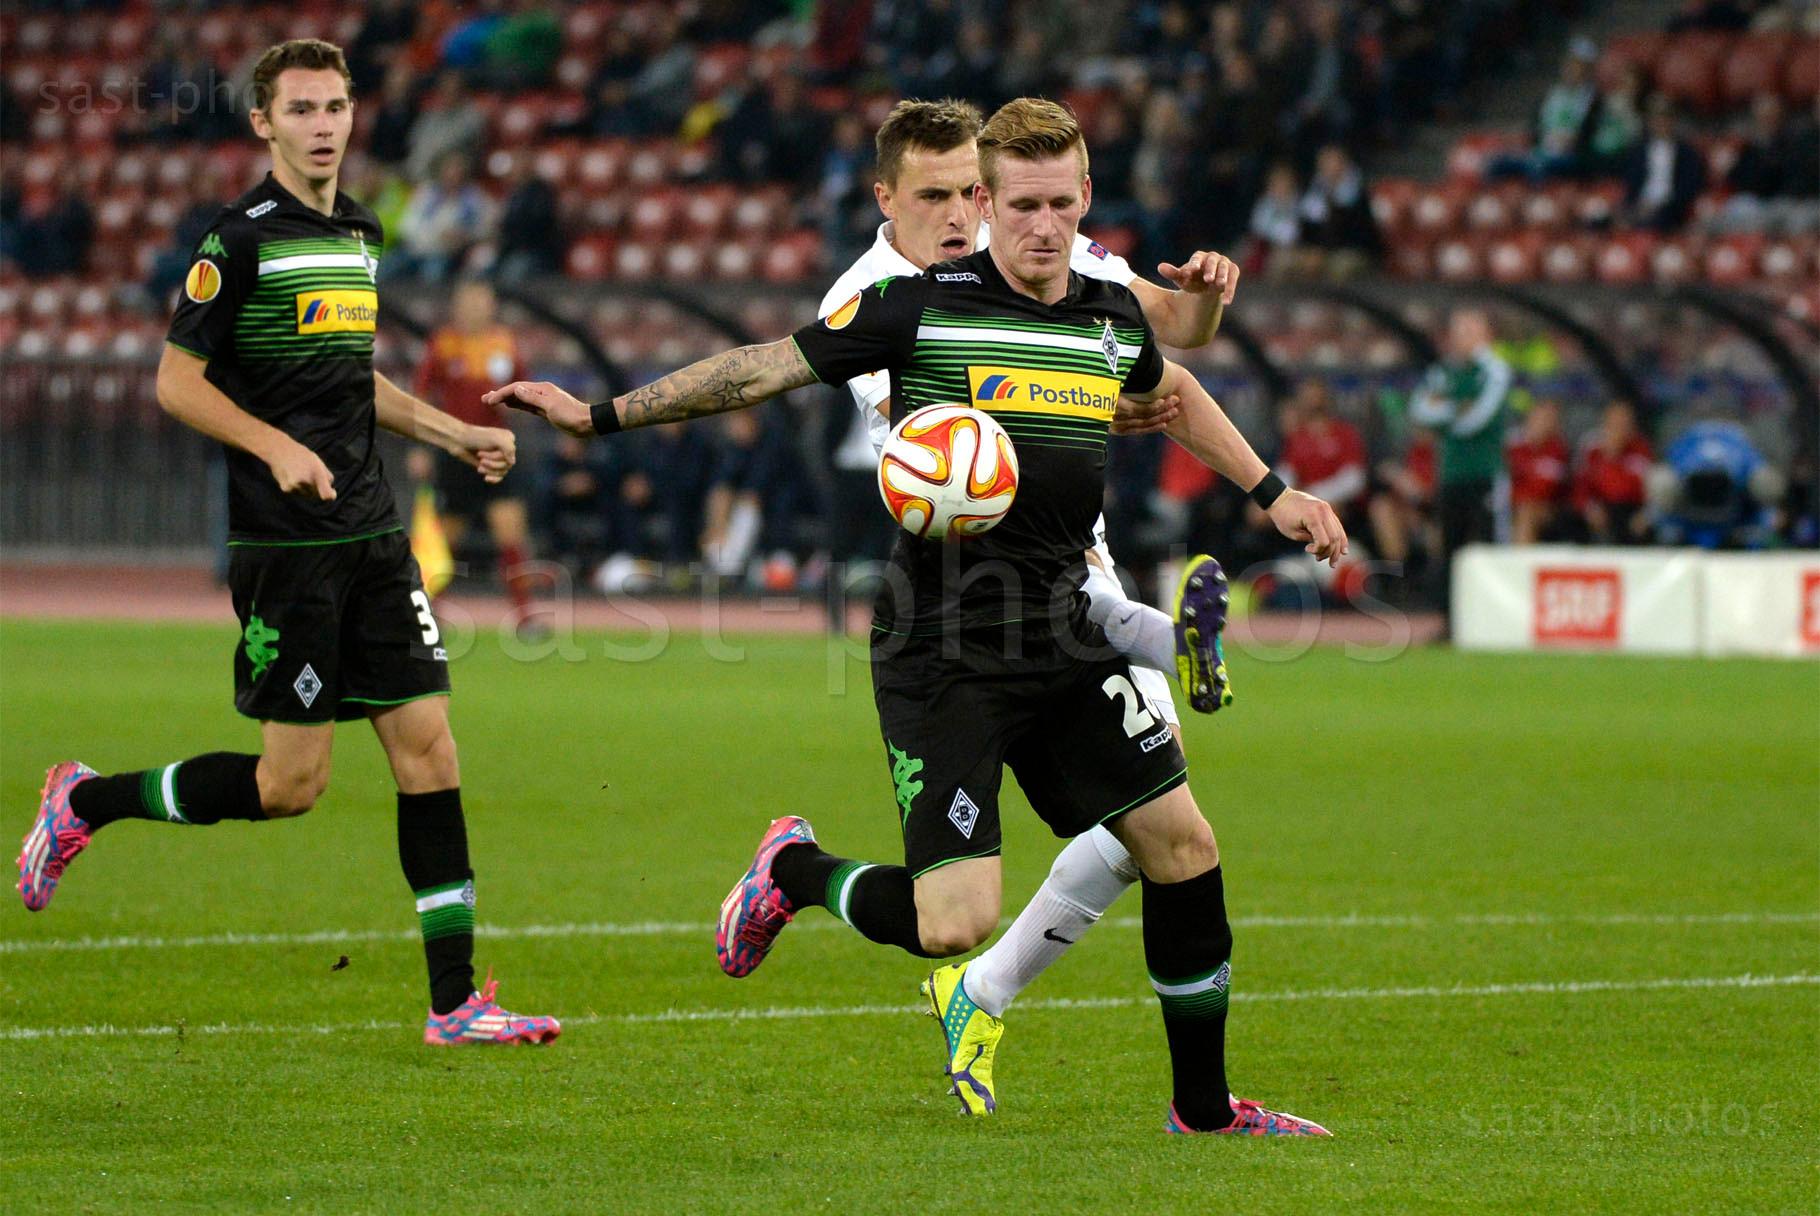 Andre Hahn (Gladbach) gegen Burim Kukeli (FCZ)